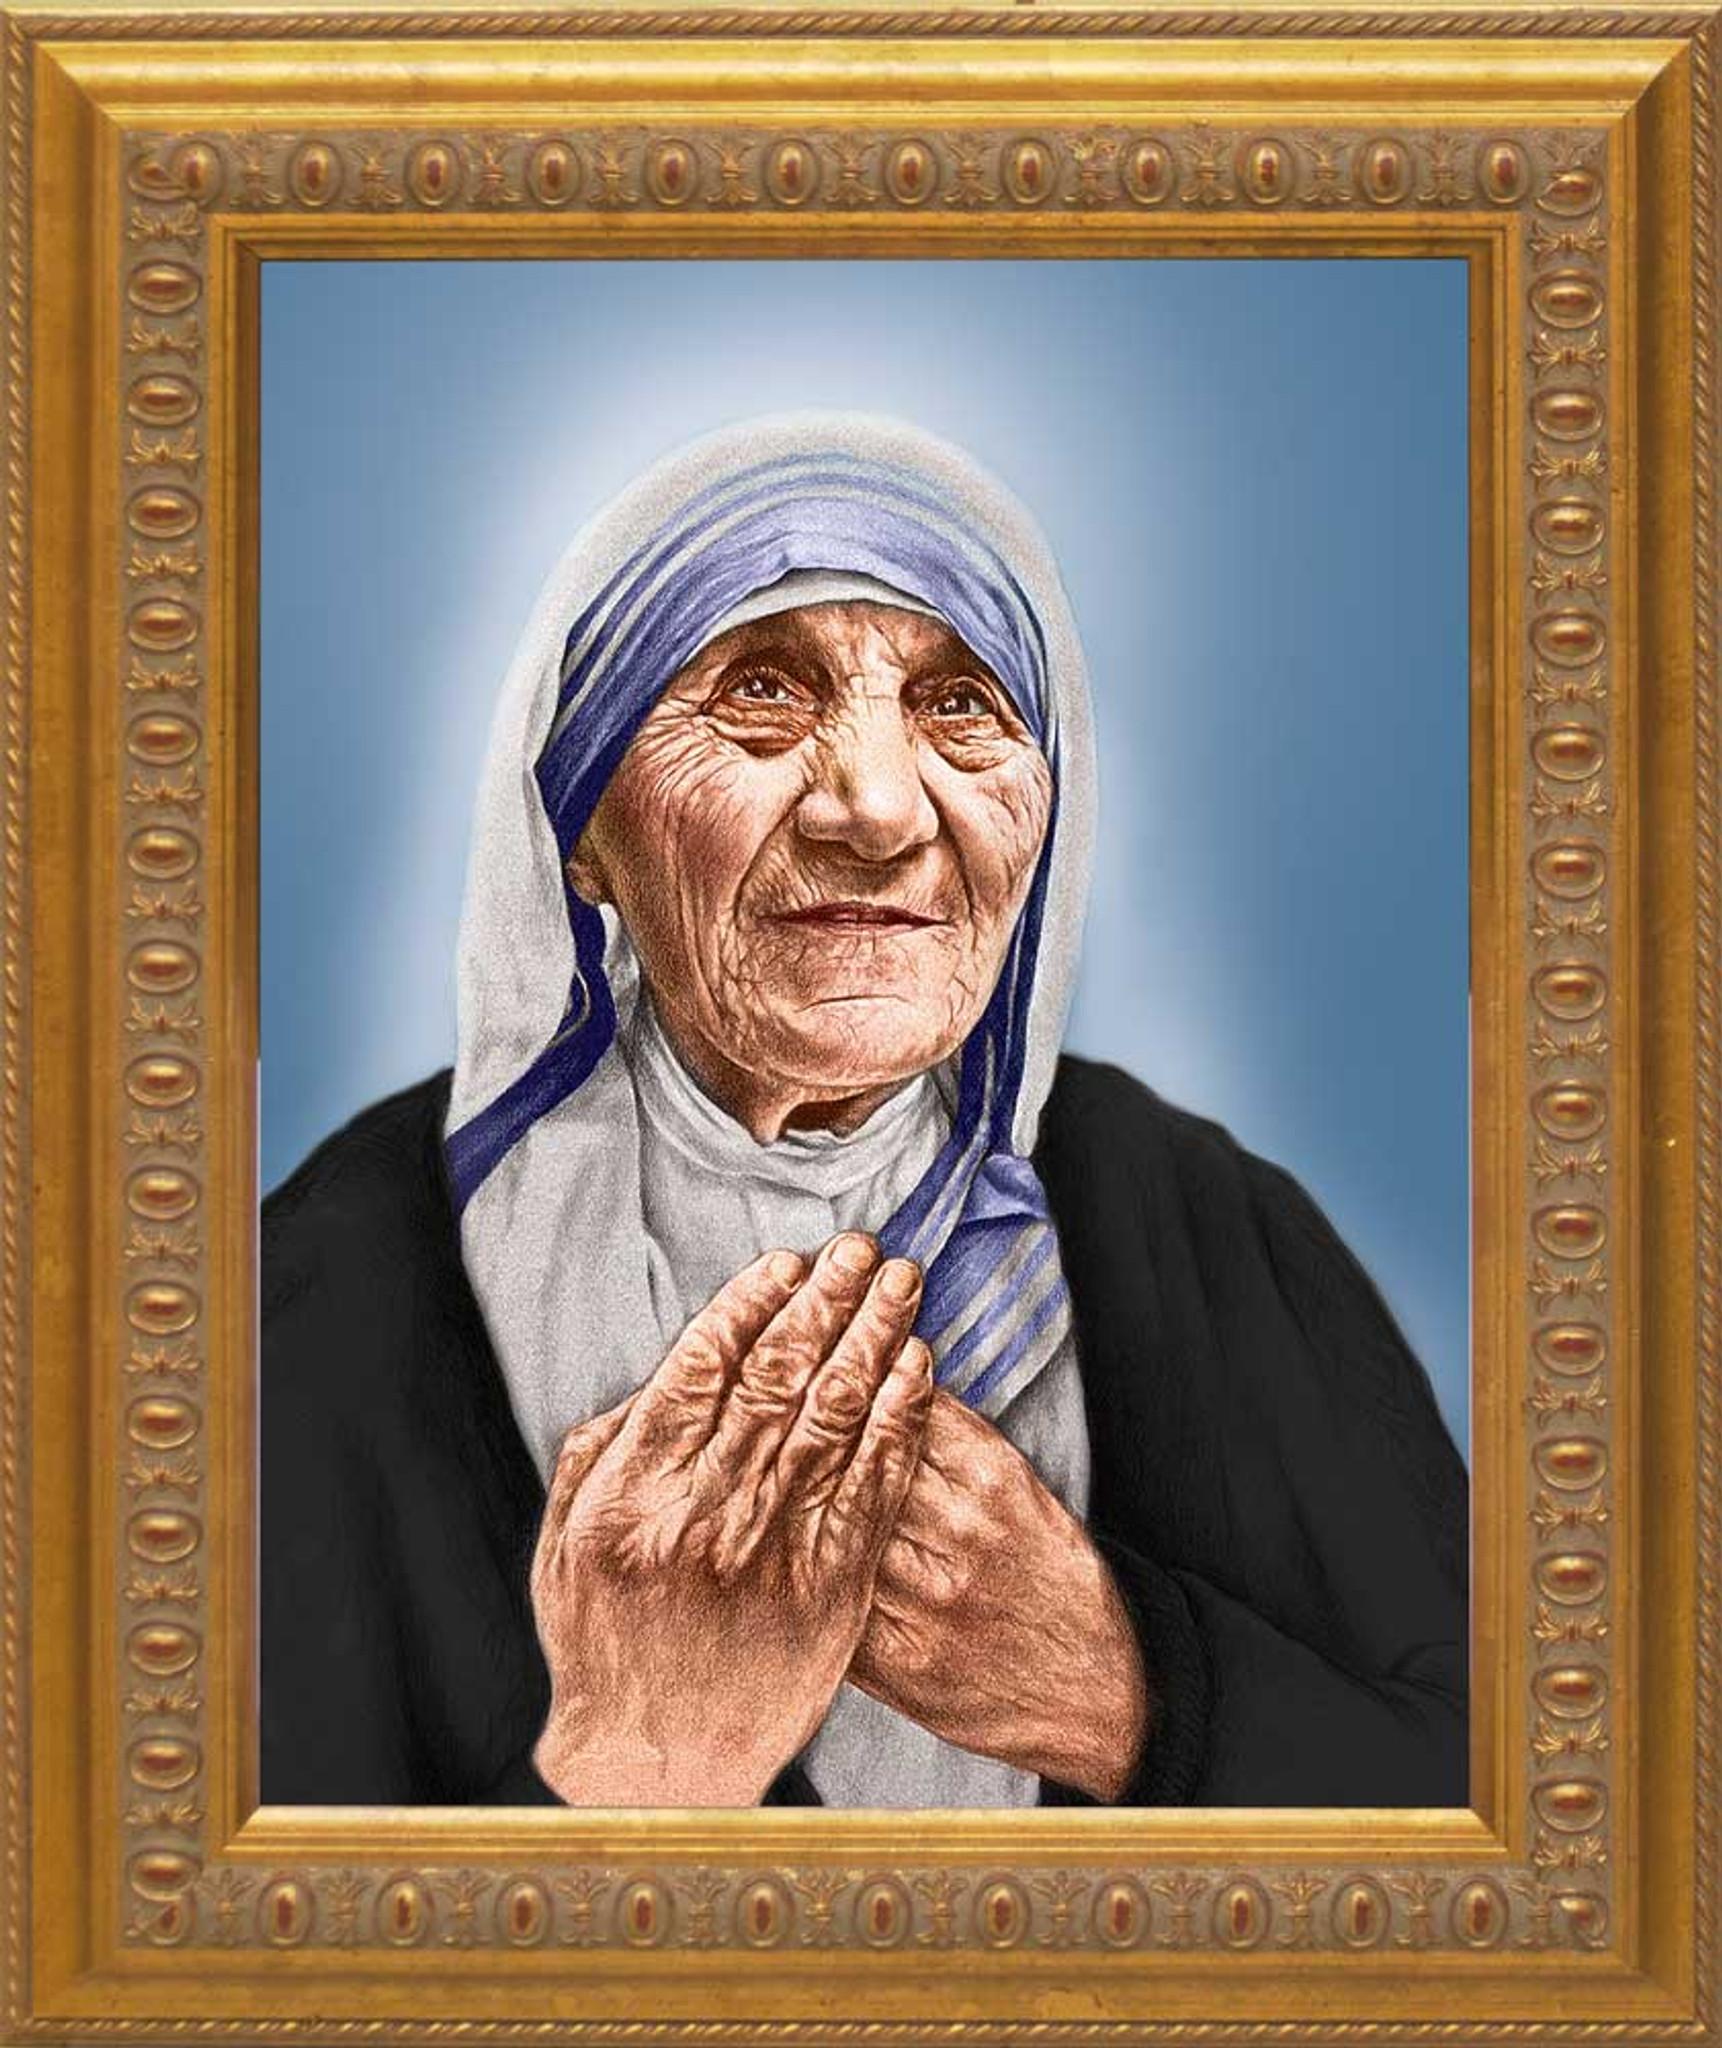 BADBOYS DELUXE: SAINT (MOTHER) TERESA OF CALCUTTA - AGNES